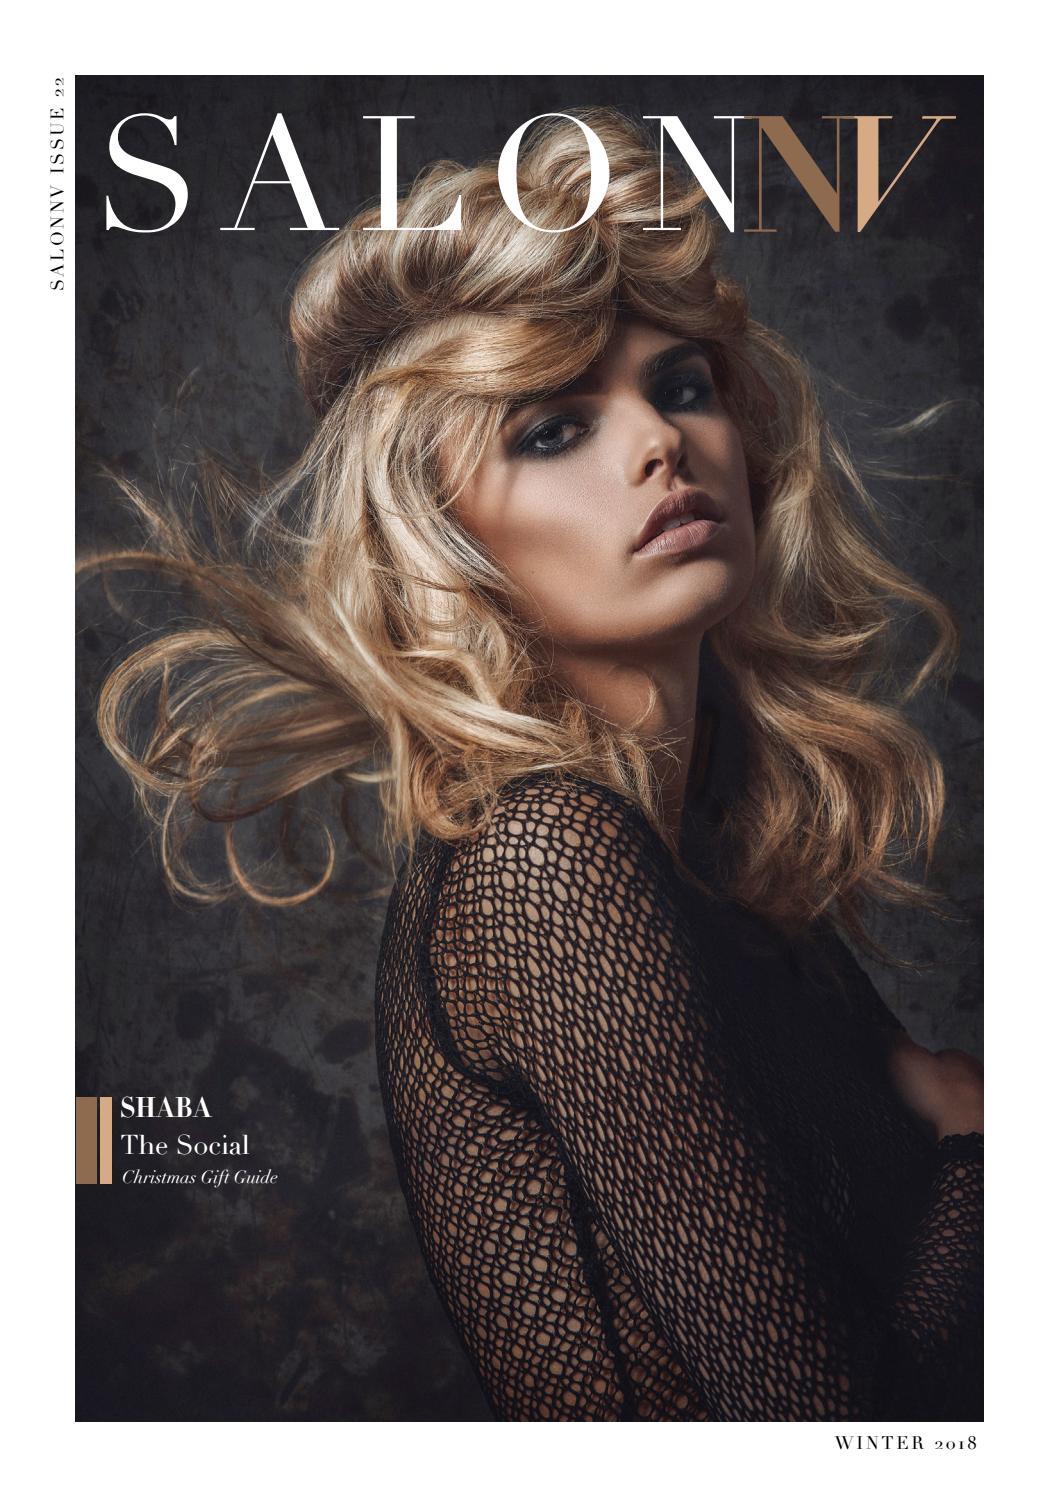 ede5e6b2835aa SalonNV Issue 22 by Gallus Media - issuu